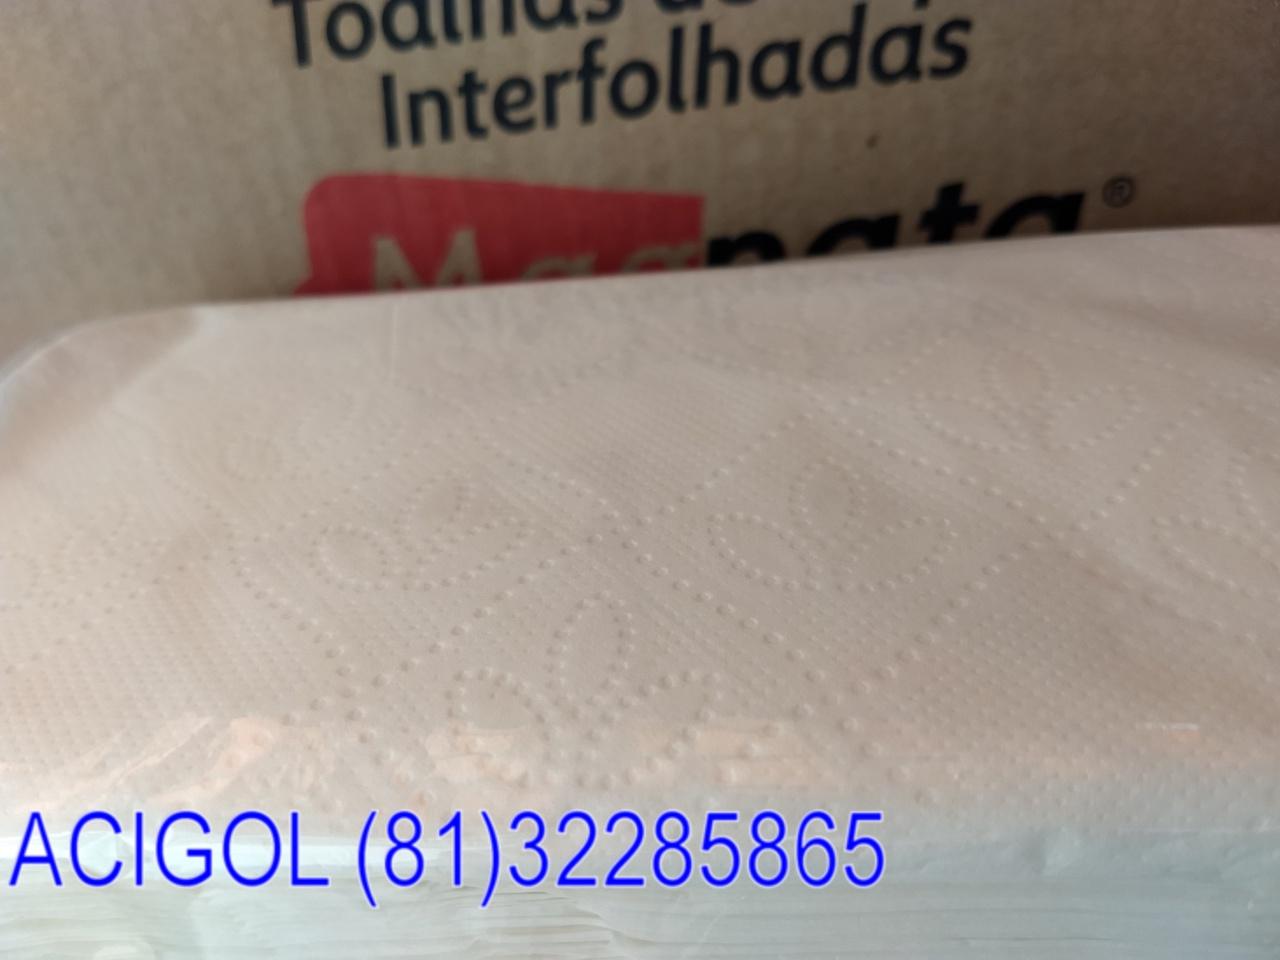 PAPEL TOALHA INTERFOLHA MAGNATA 2400 FOLHAS DOLHAS-ACIGOL RECIFE 81 32285865-IMG_20181214_085433173